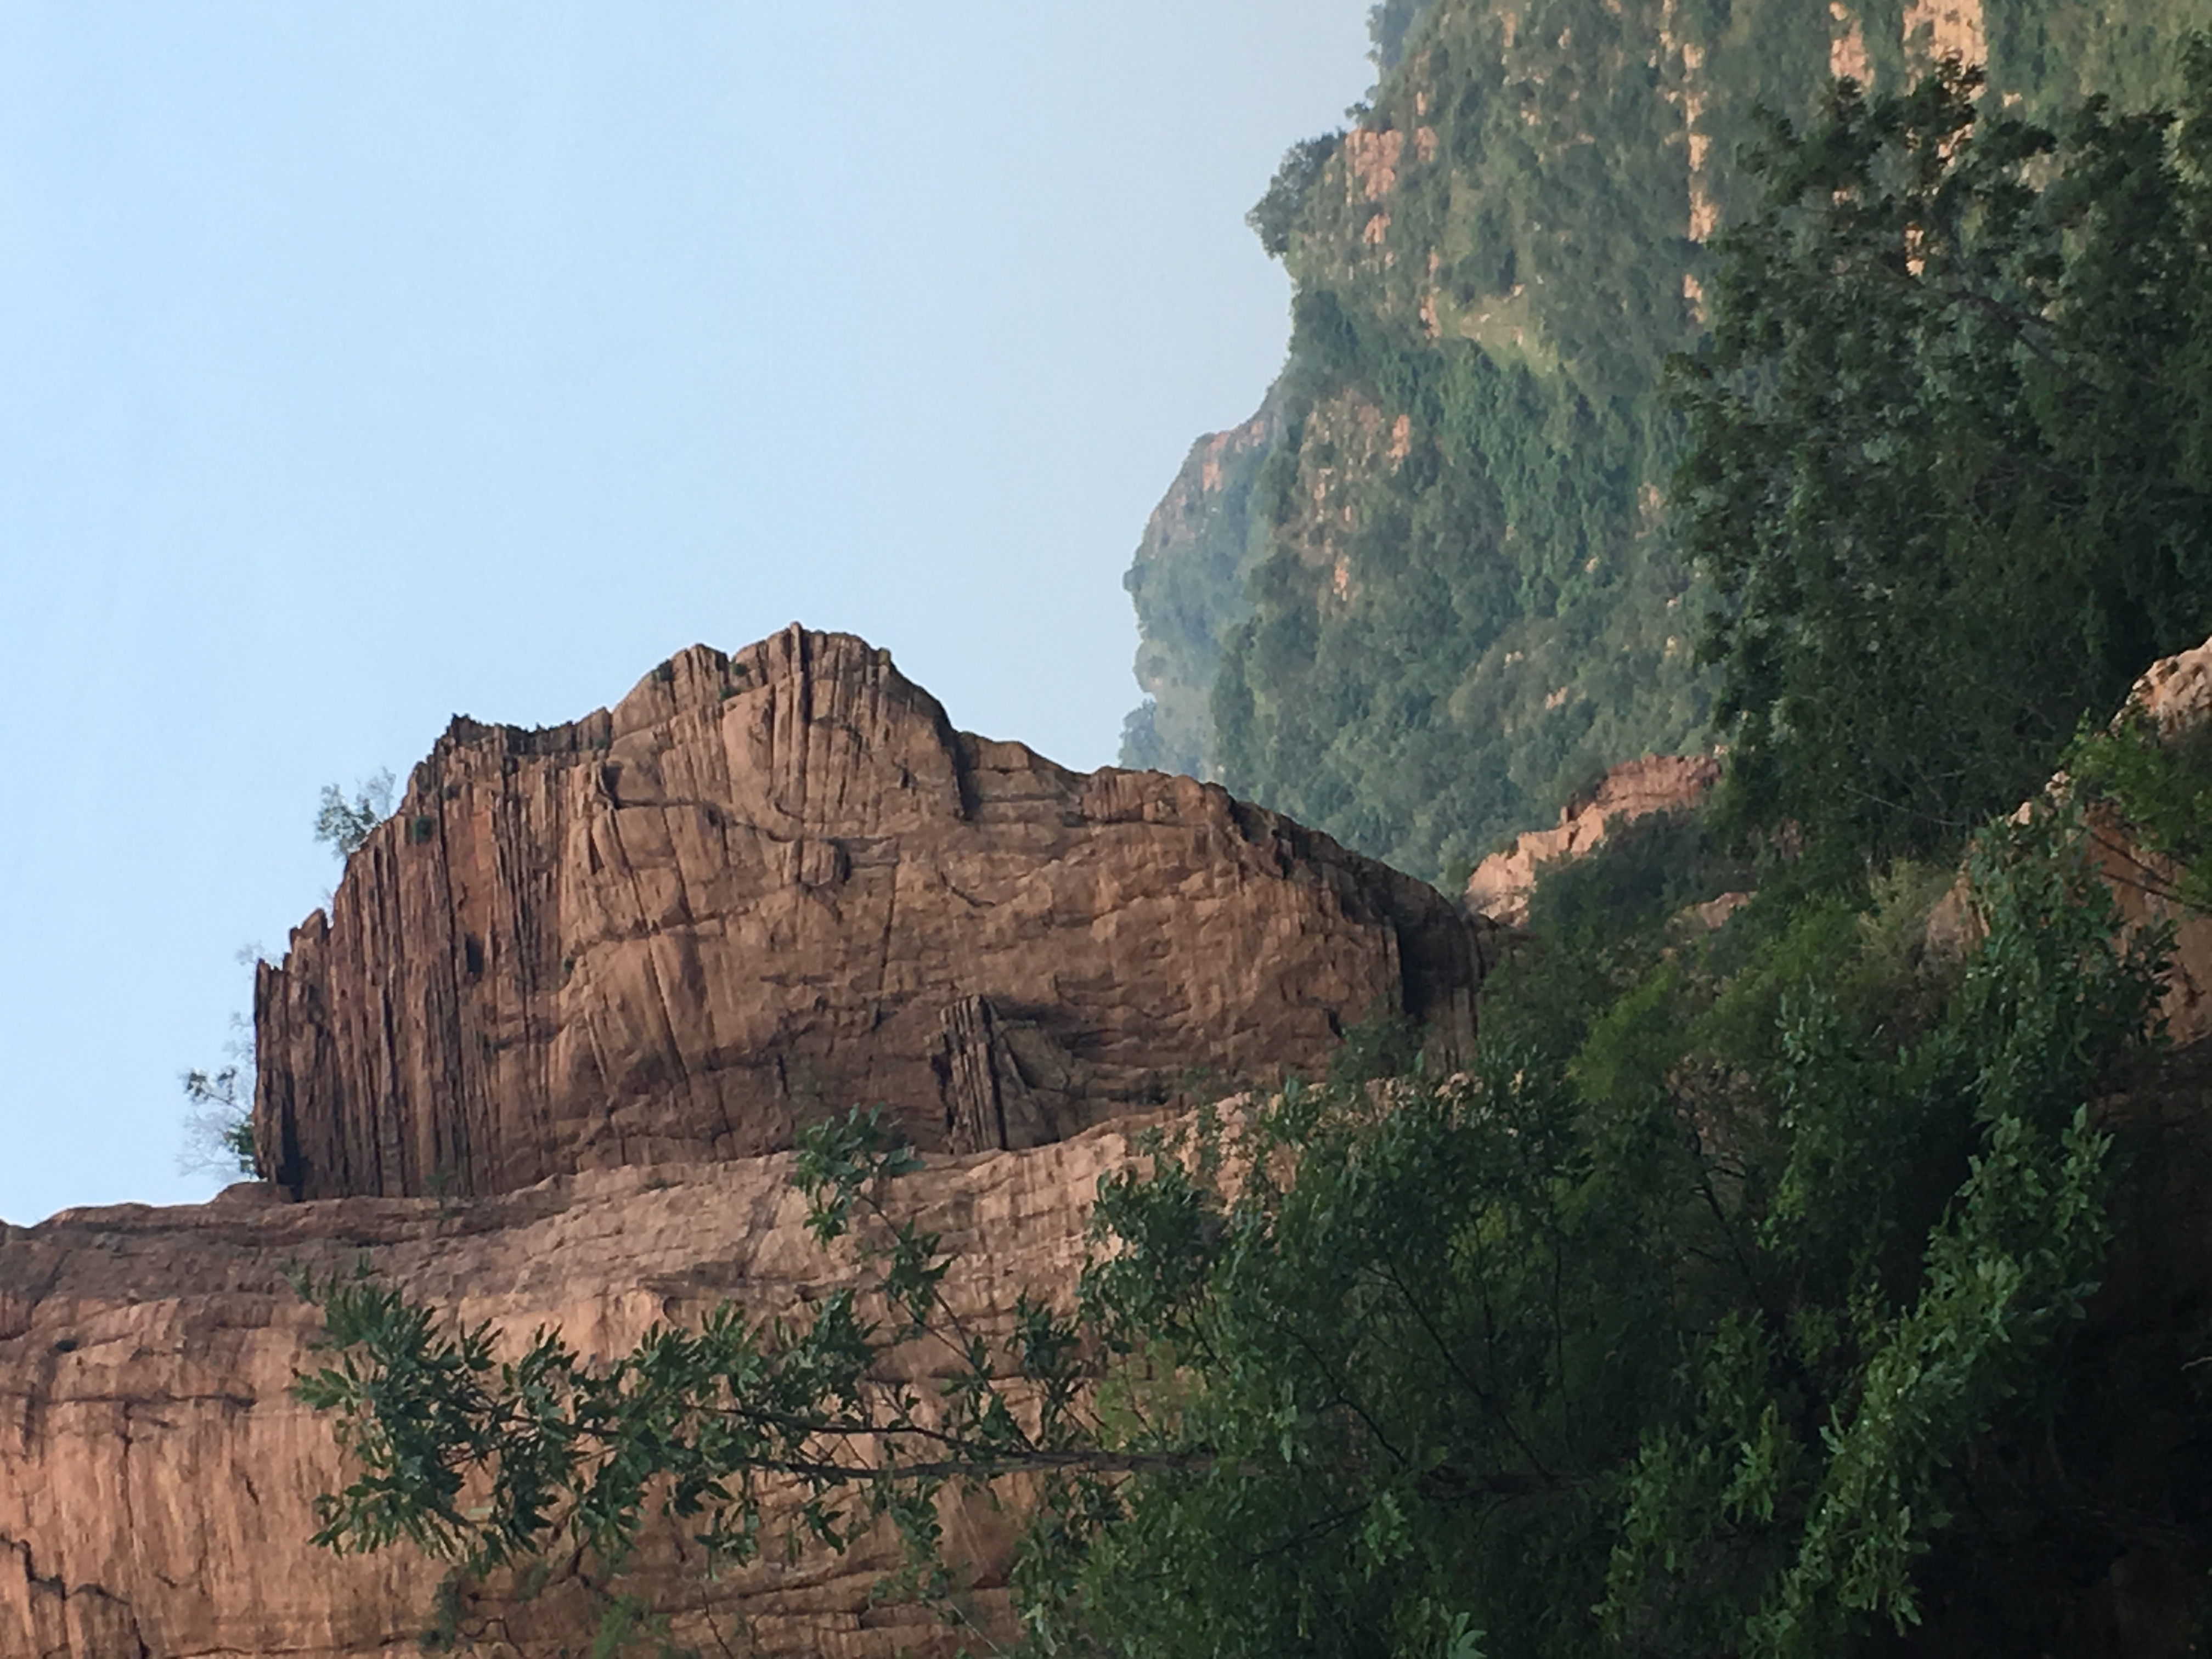 Ningyo Mountain, China, Cliffs, Form, Human, HQ Photo